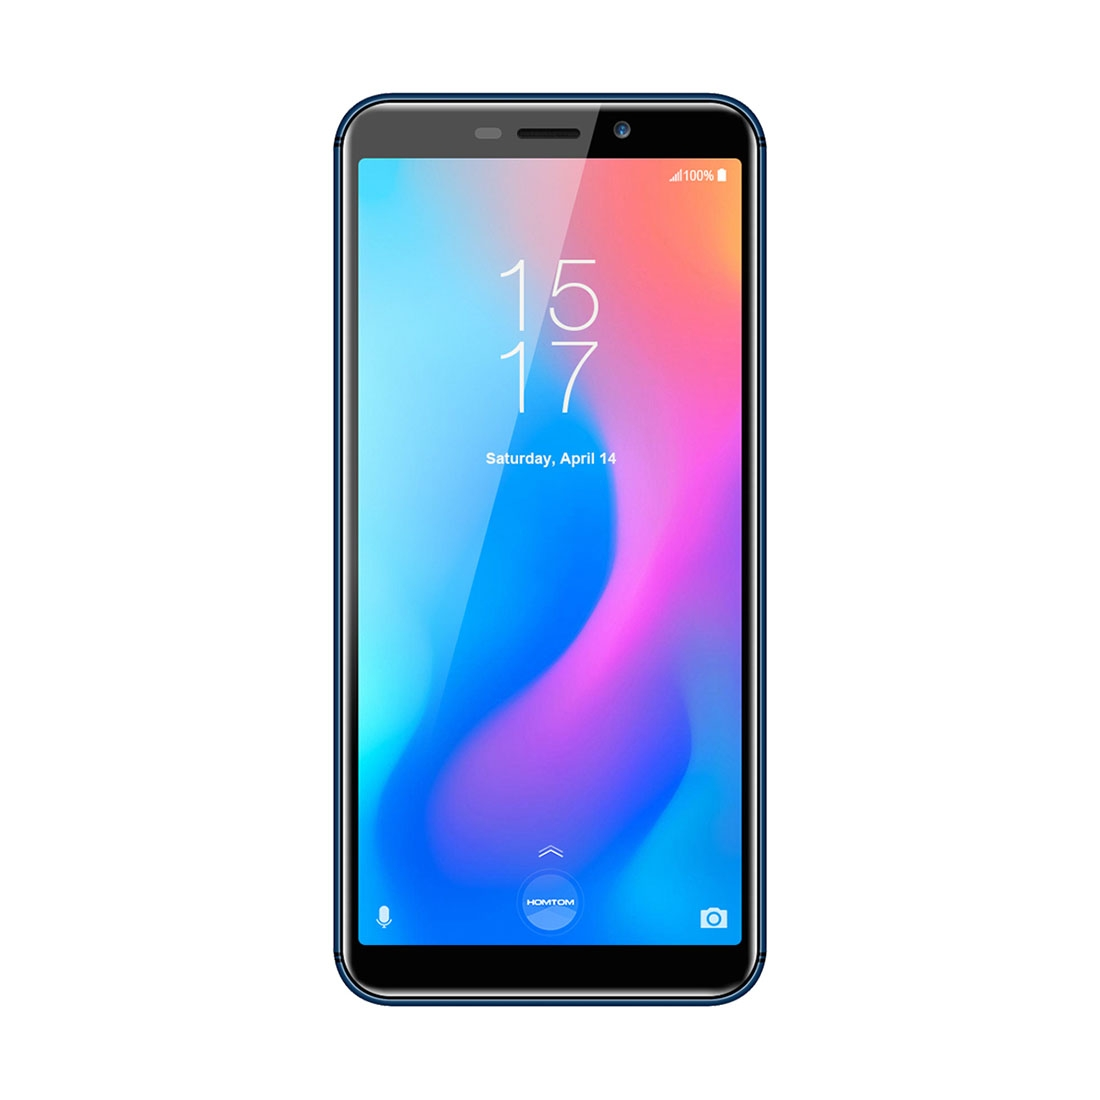 Смартфон HOMTOM C2 2GB+16GB Разблокировка через Face ID и отпечаток пальца 5.5 дюйма Android 8.1 MTK6739 4 ядрадо 1.5GHz